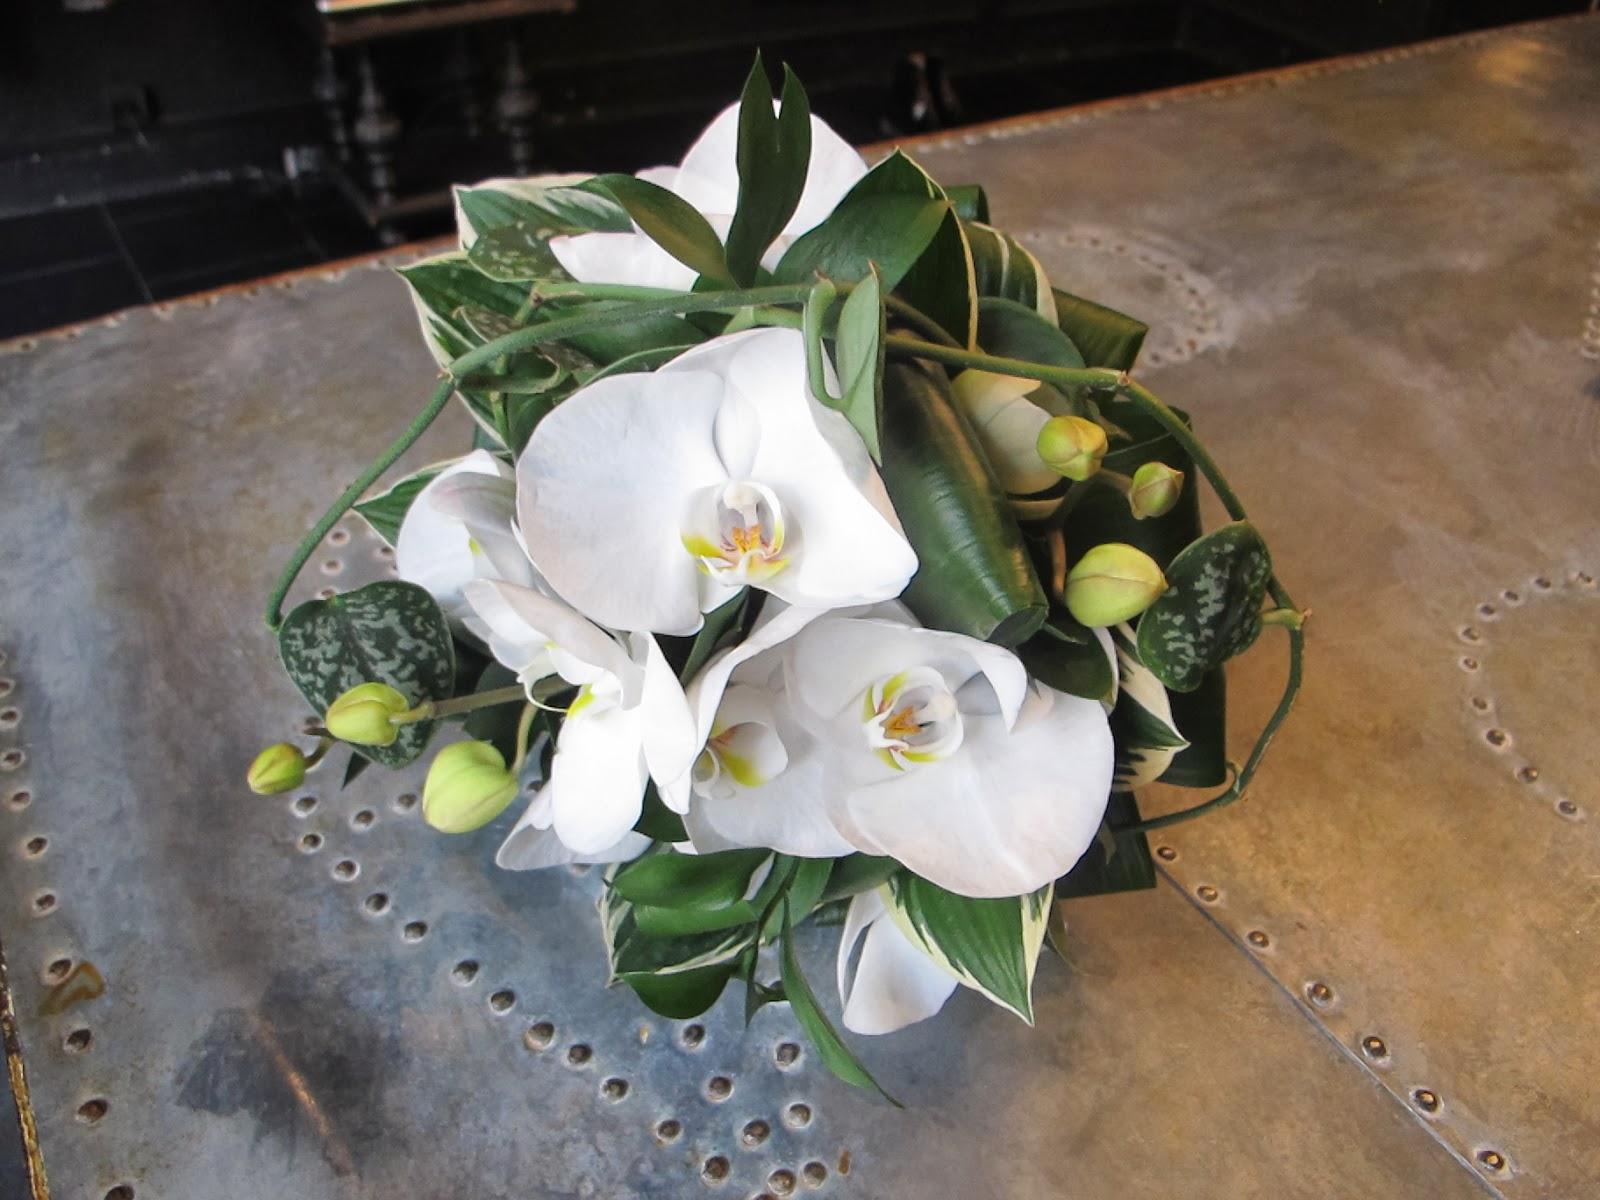 La fleureuse blog mariage orchid e - Deco mariage orchidee ...